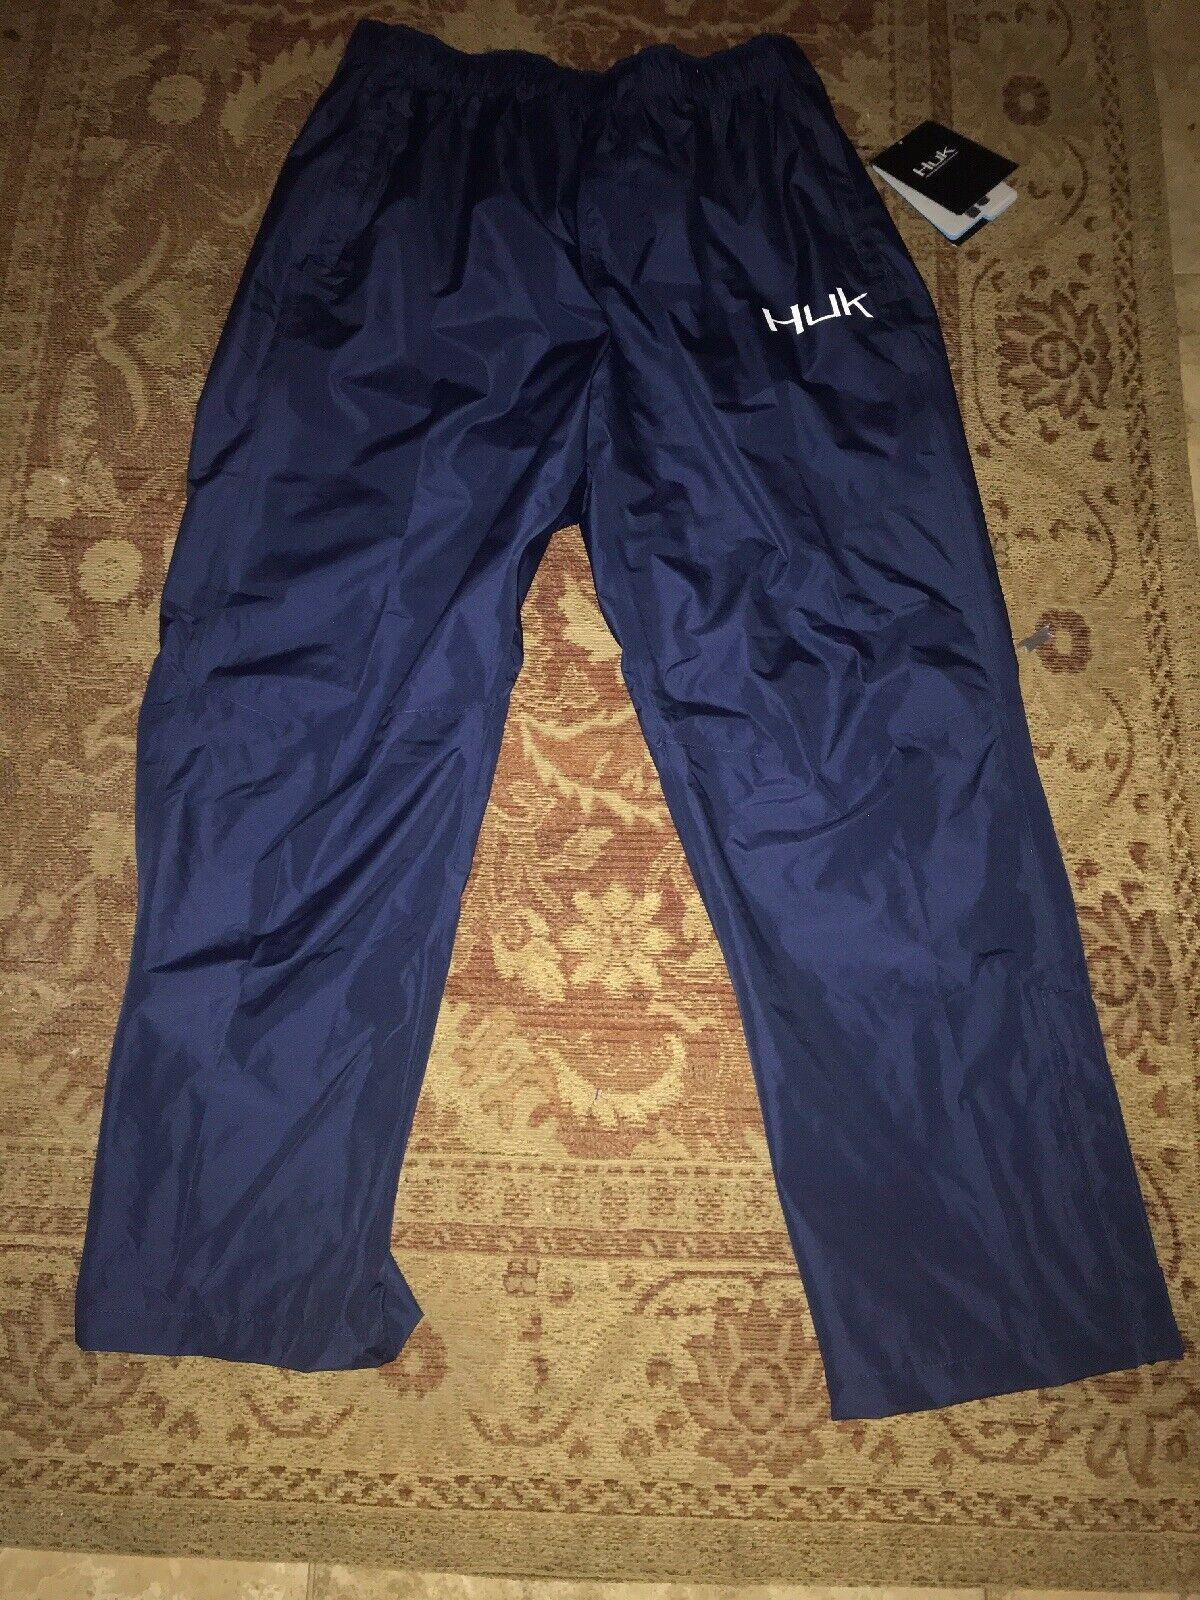 NWT  99 Mens HUK FISHING PERFORMANCE NAVY Blau PACKABLE RAIN PANTS Sz XXL